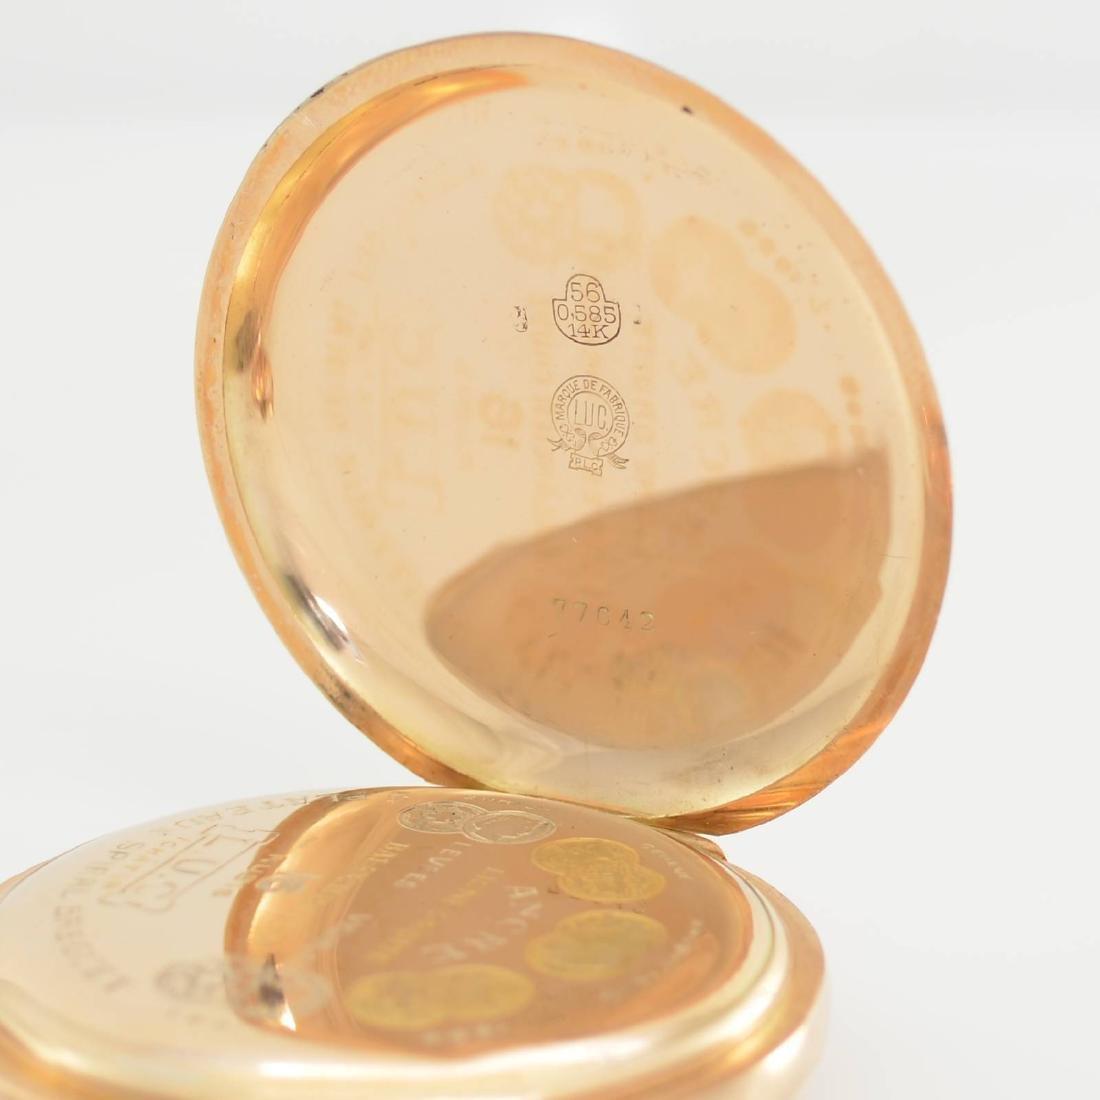 L.U.C. Chopard 14k pink gold pocket watch - 5